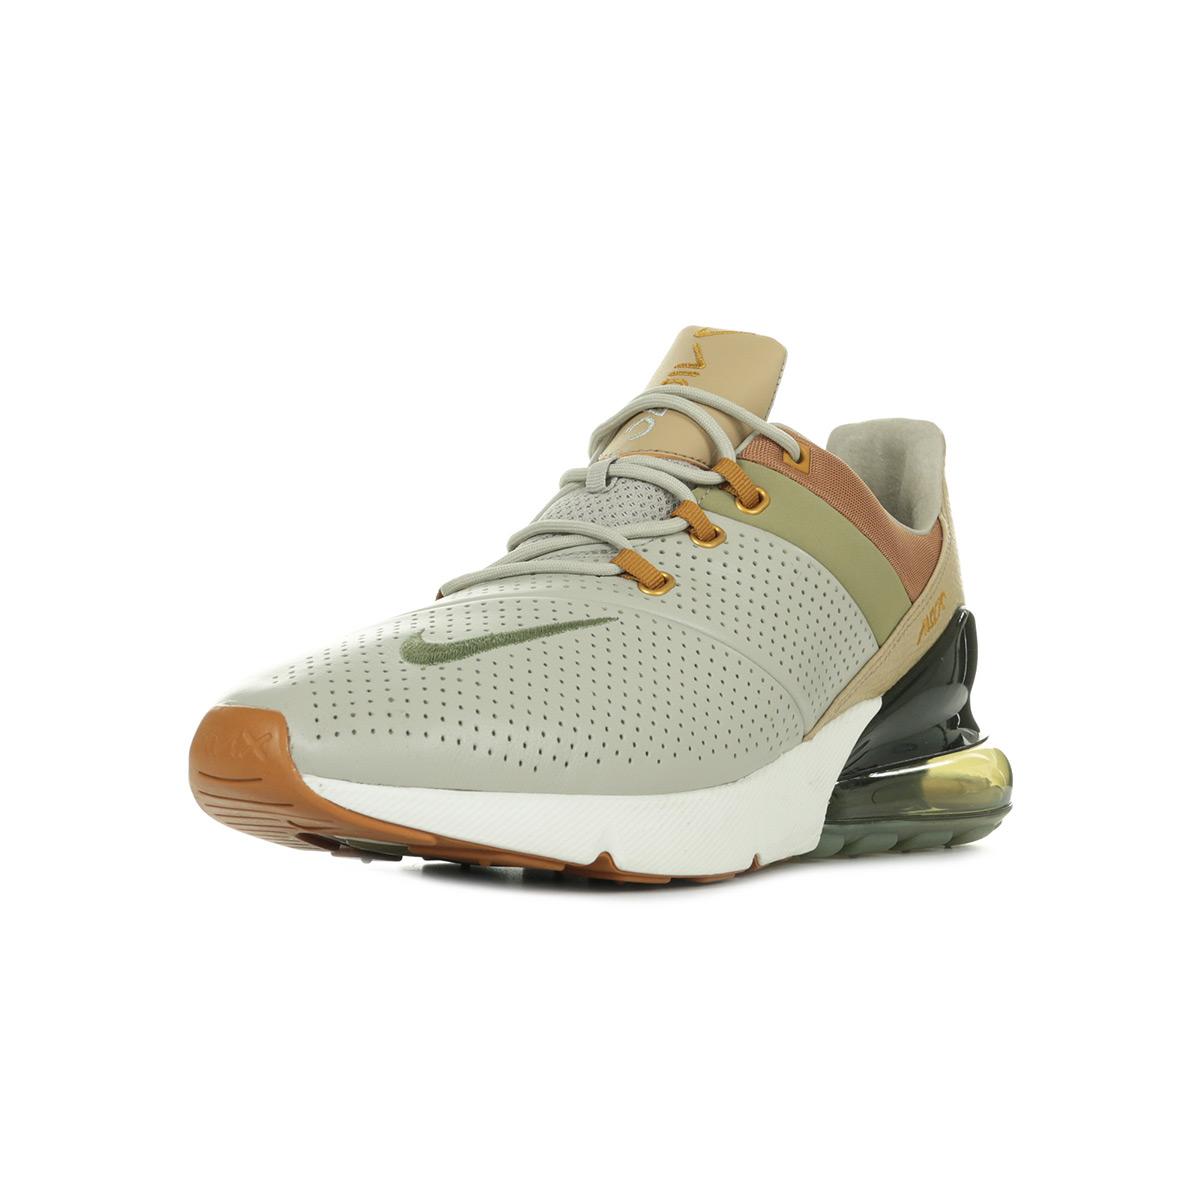 Detalles de Chaussures Baskets Nike homme Air Max 270 Premium